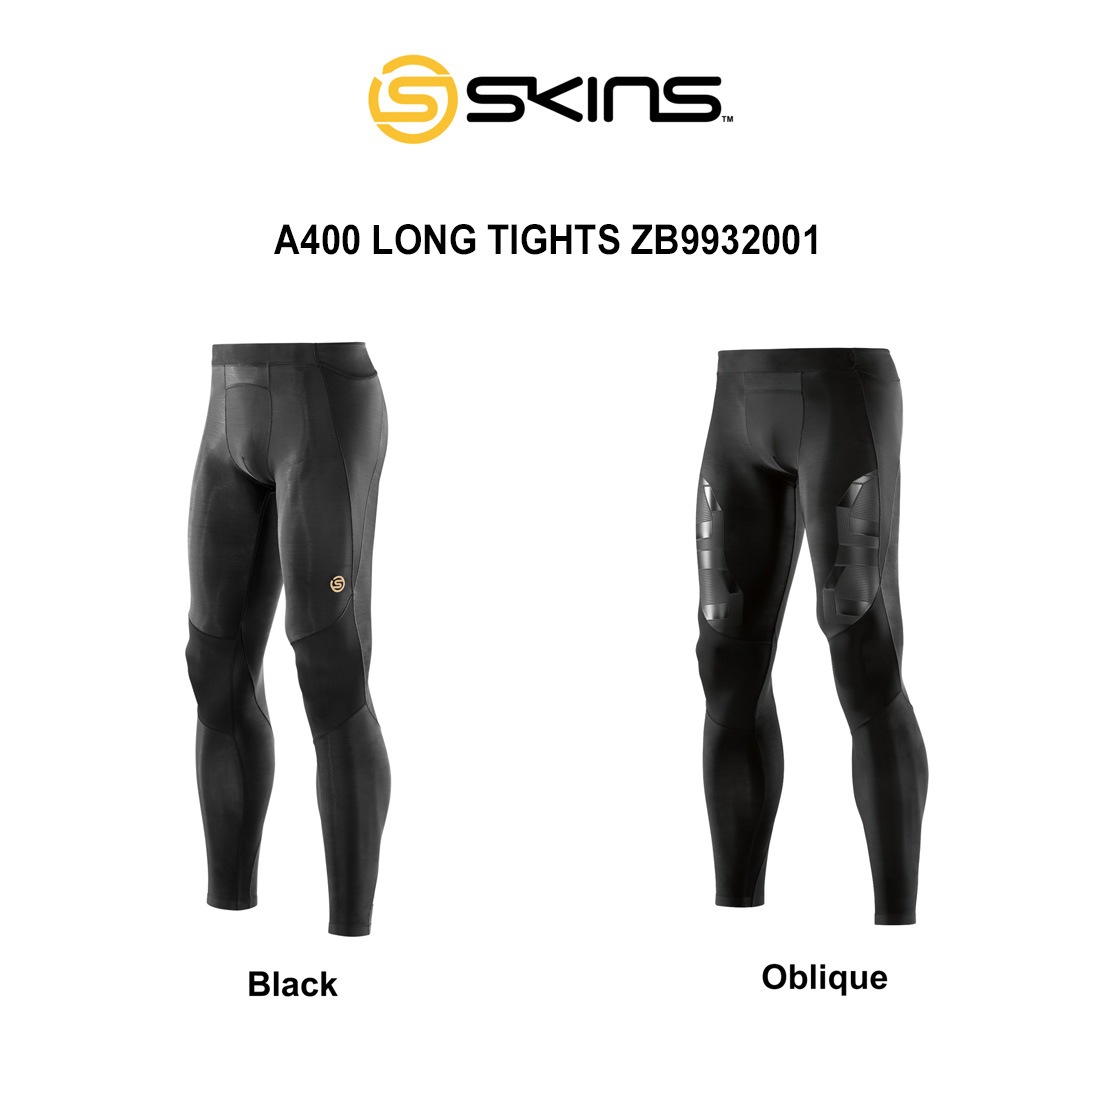 SKINS(スキンズ)ロングタイツ コンプレッション メンズ A400 LONG TIGHTS ZB9932001